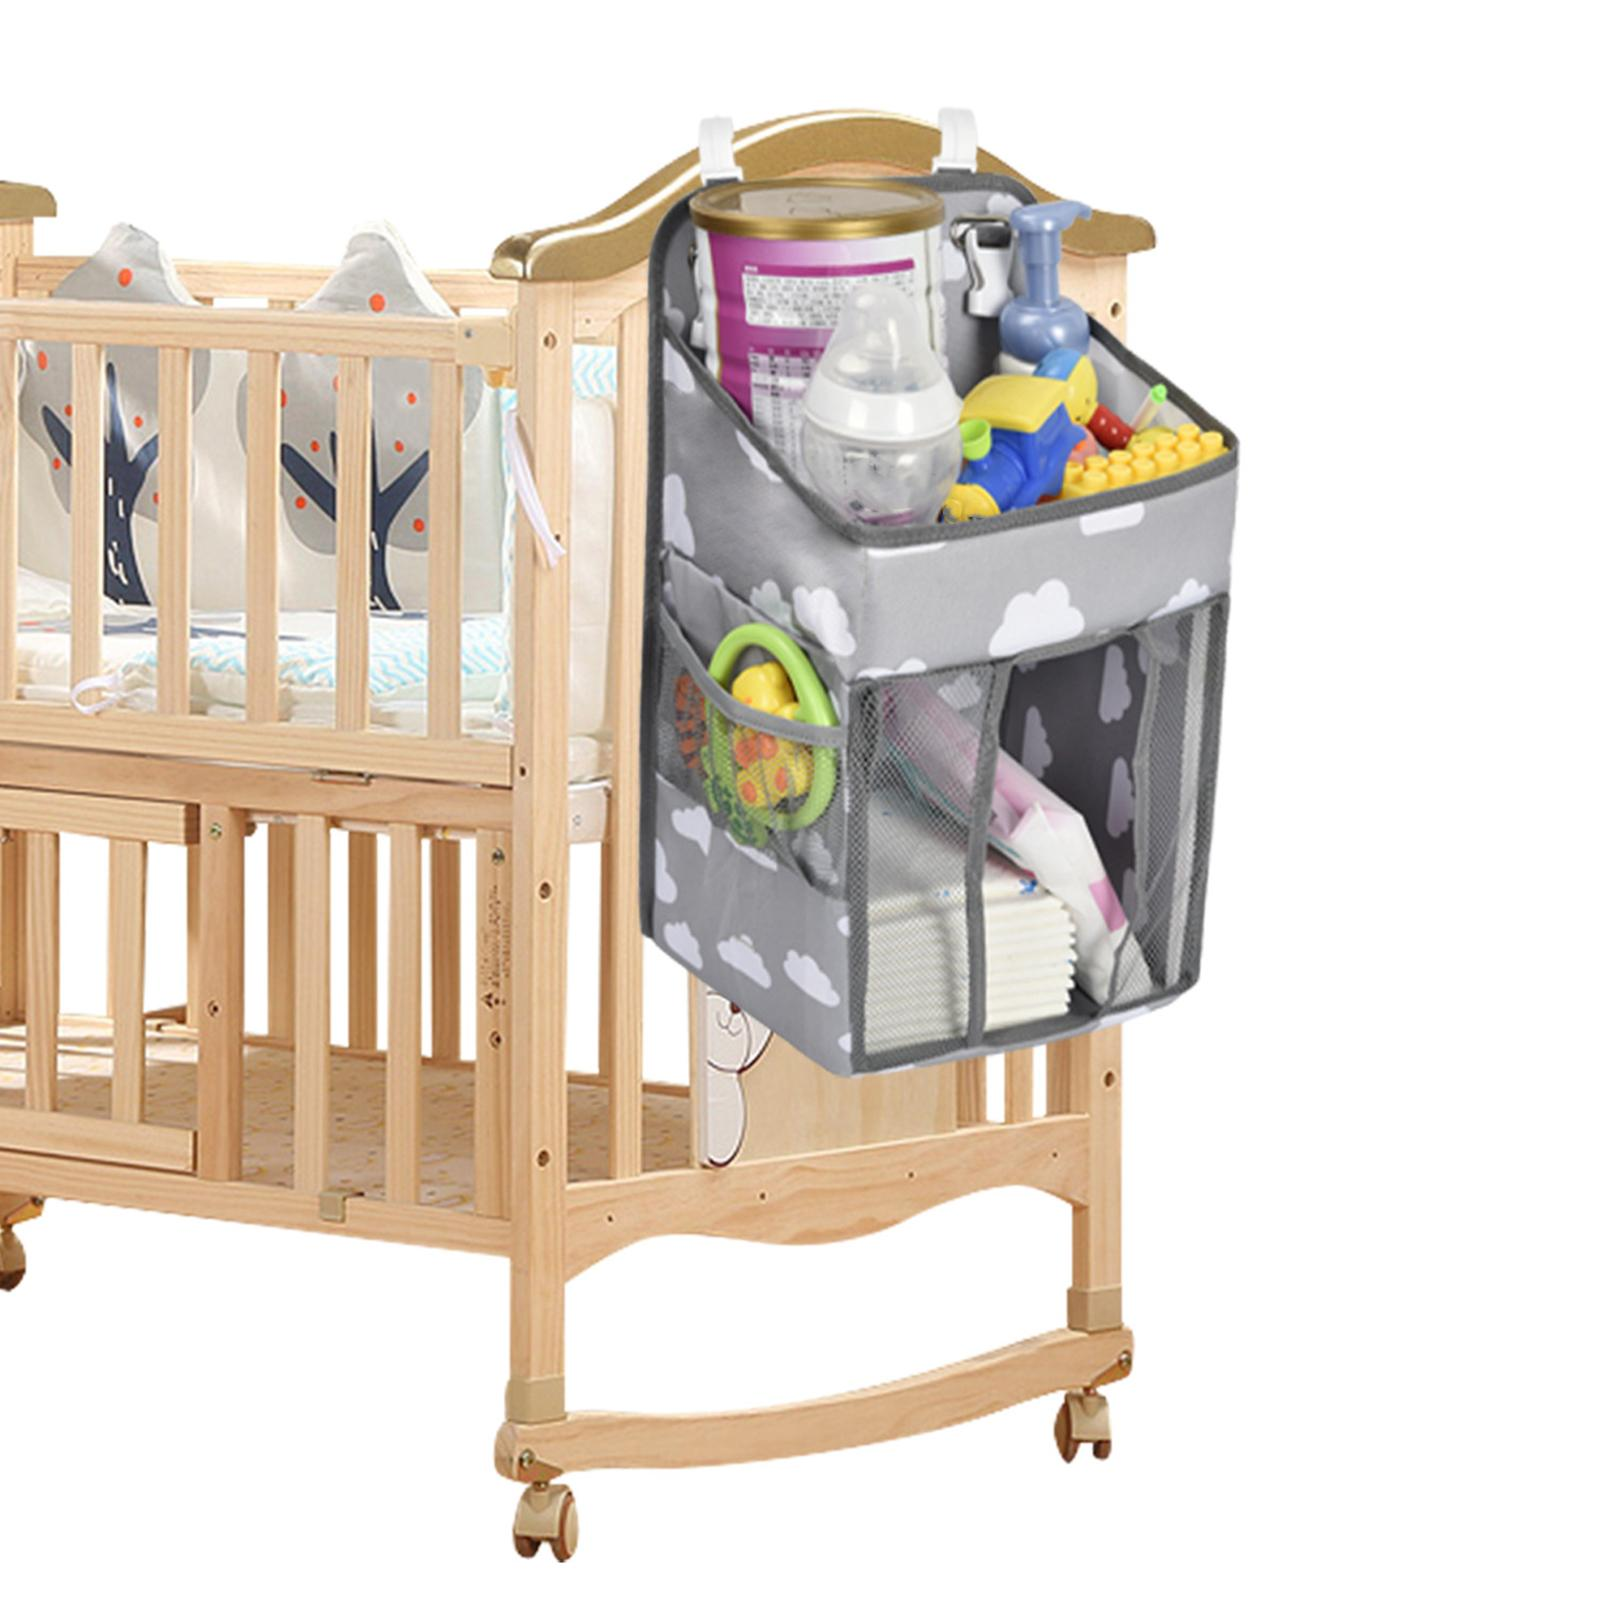 Baby Multifunctional Hanging Storage Bag with Large Capacity Bedside Organizer Infant Baby Essentials Bedding Set Storage Bag